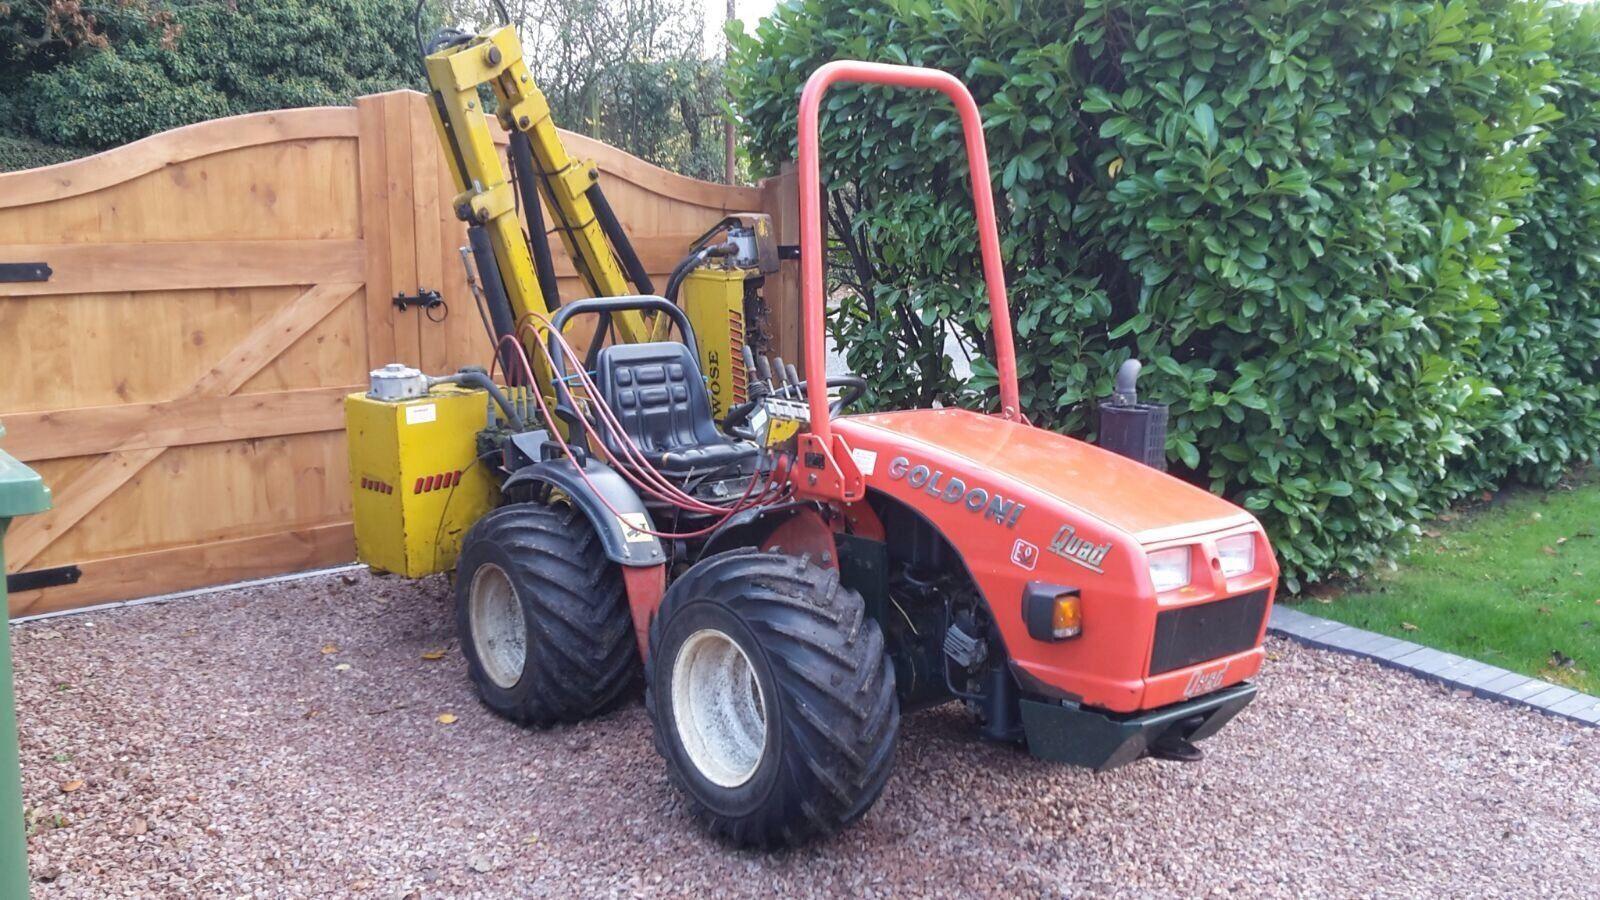 Goldoni quad forestry alpine vine yard 4x4 compact tractor - Quad cities craigslist farm and garden ...